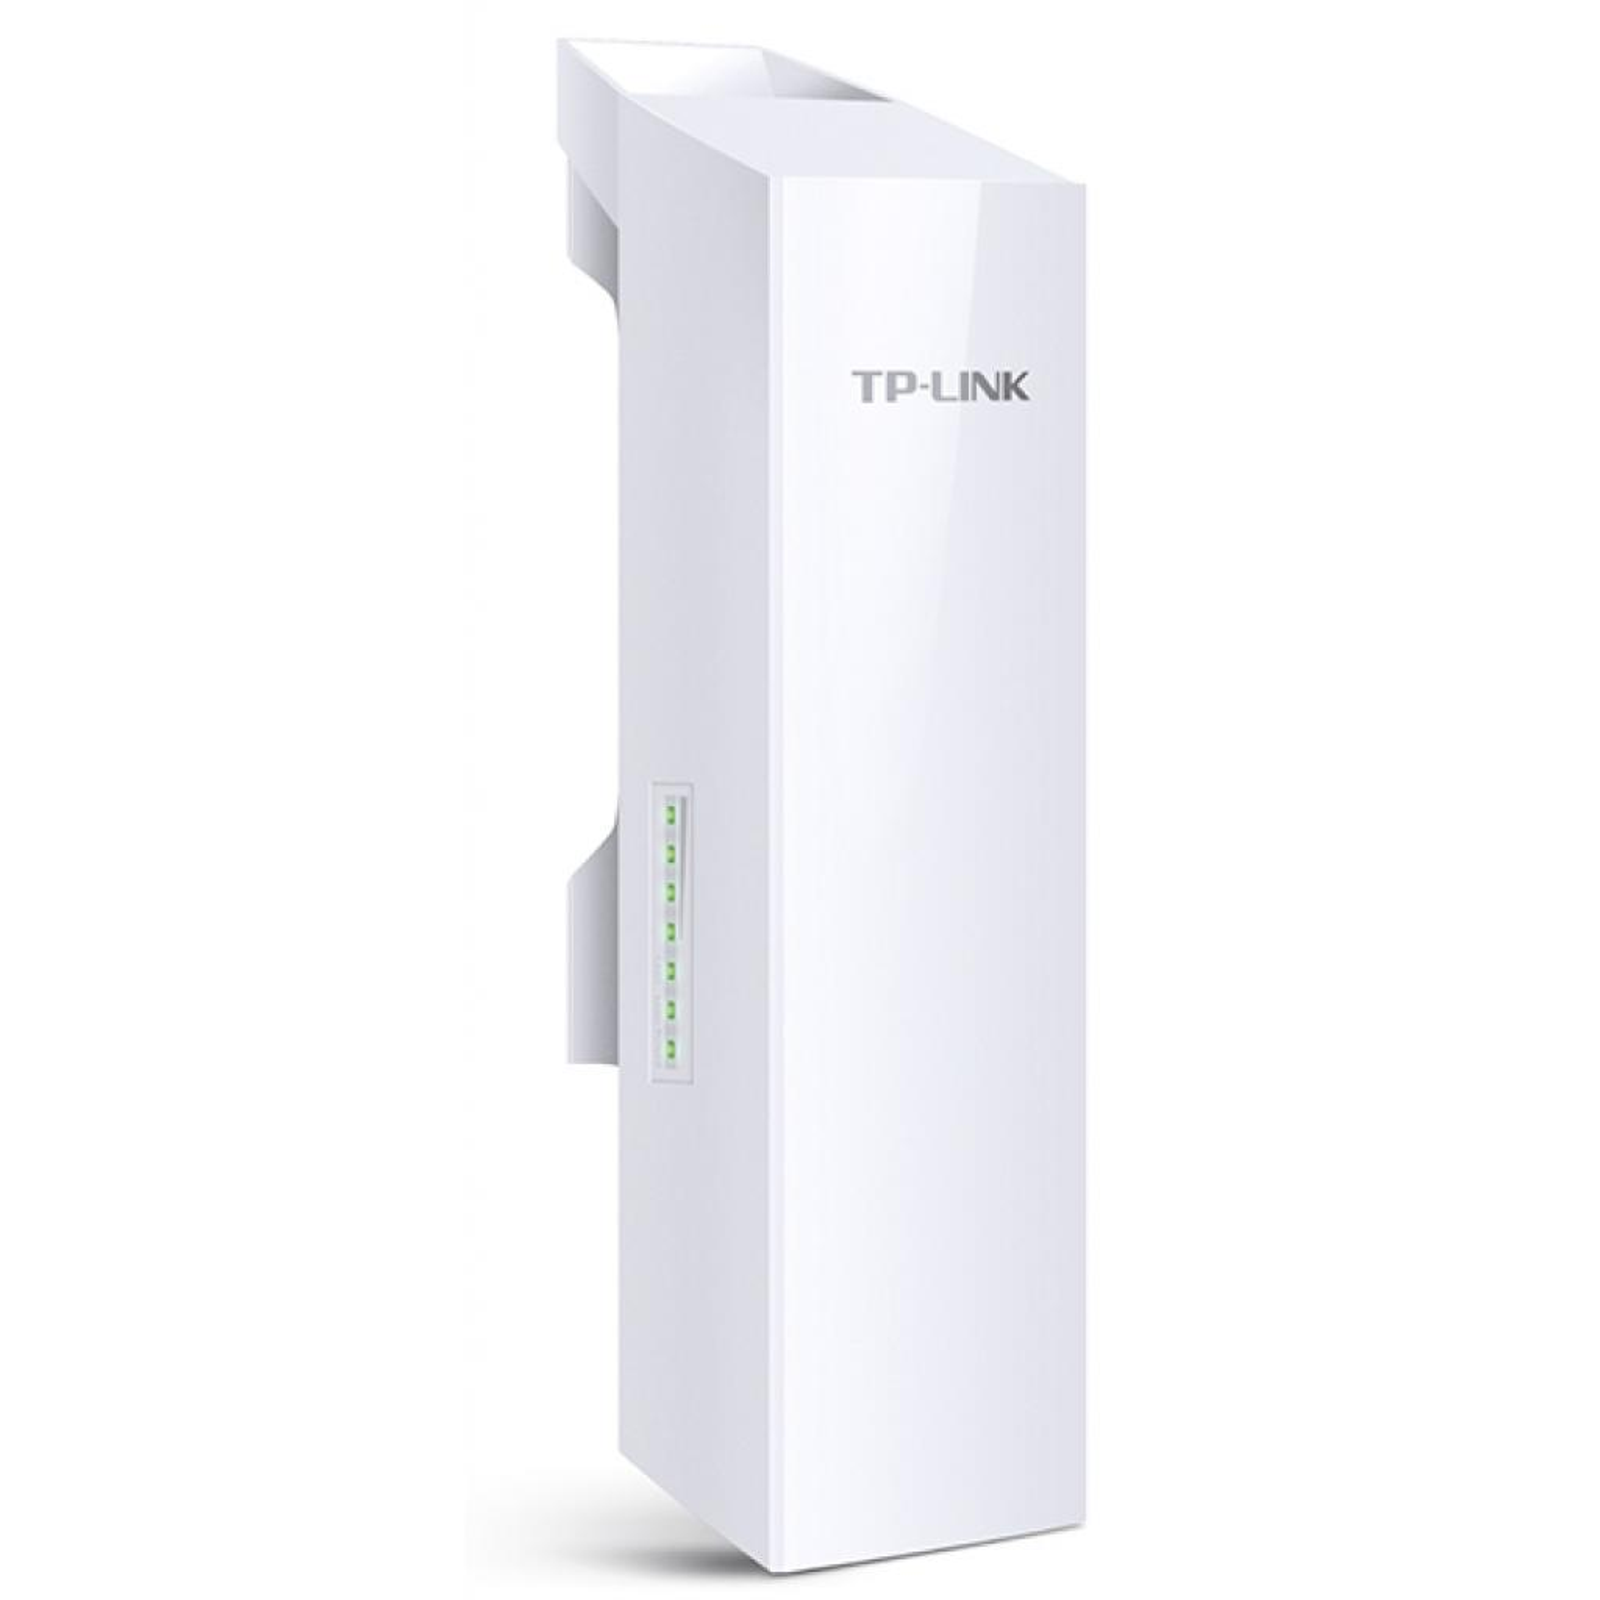 Точка доступа Wi-Fi TP-Link CPE510